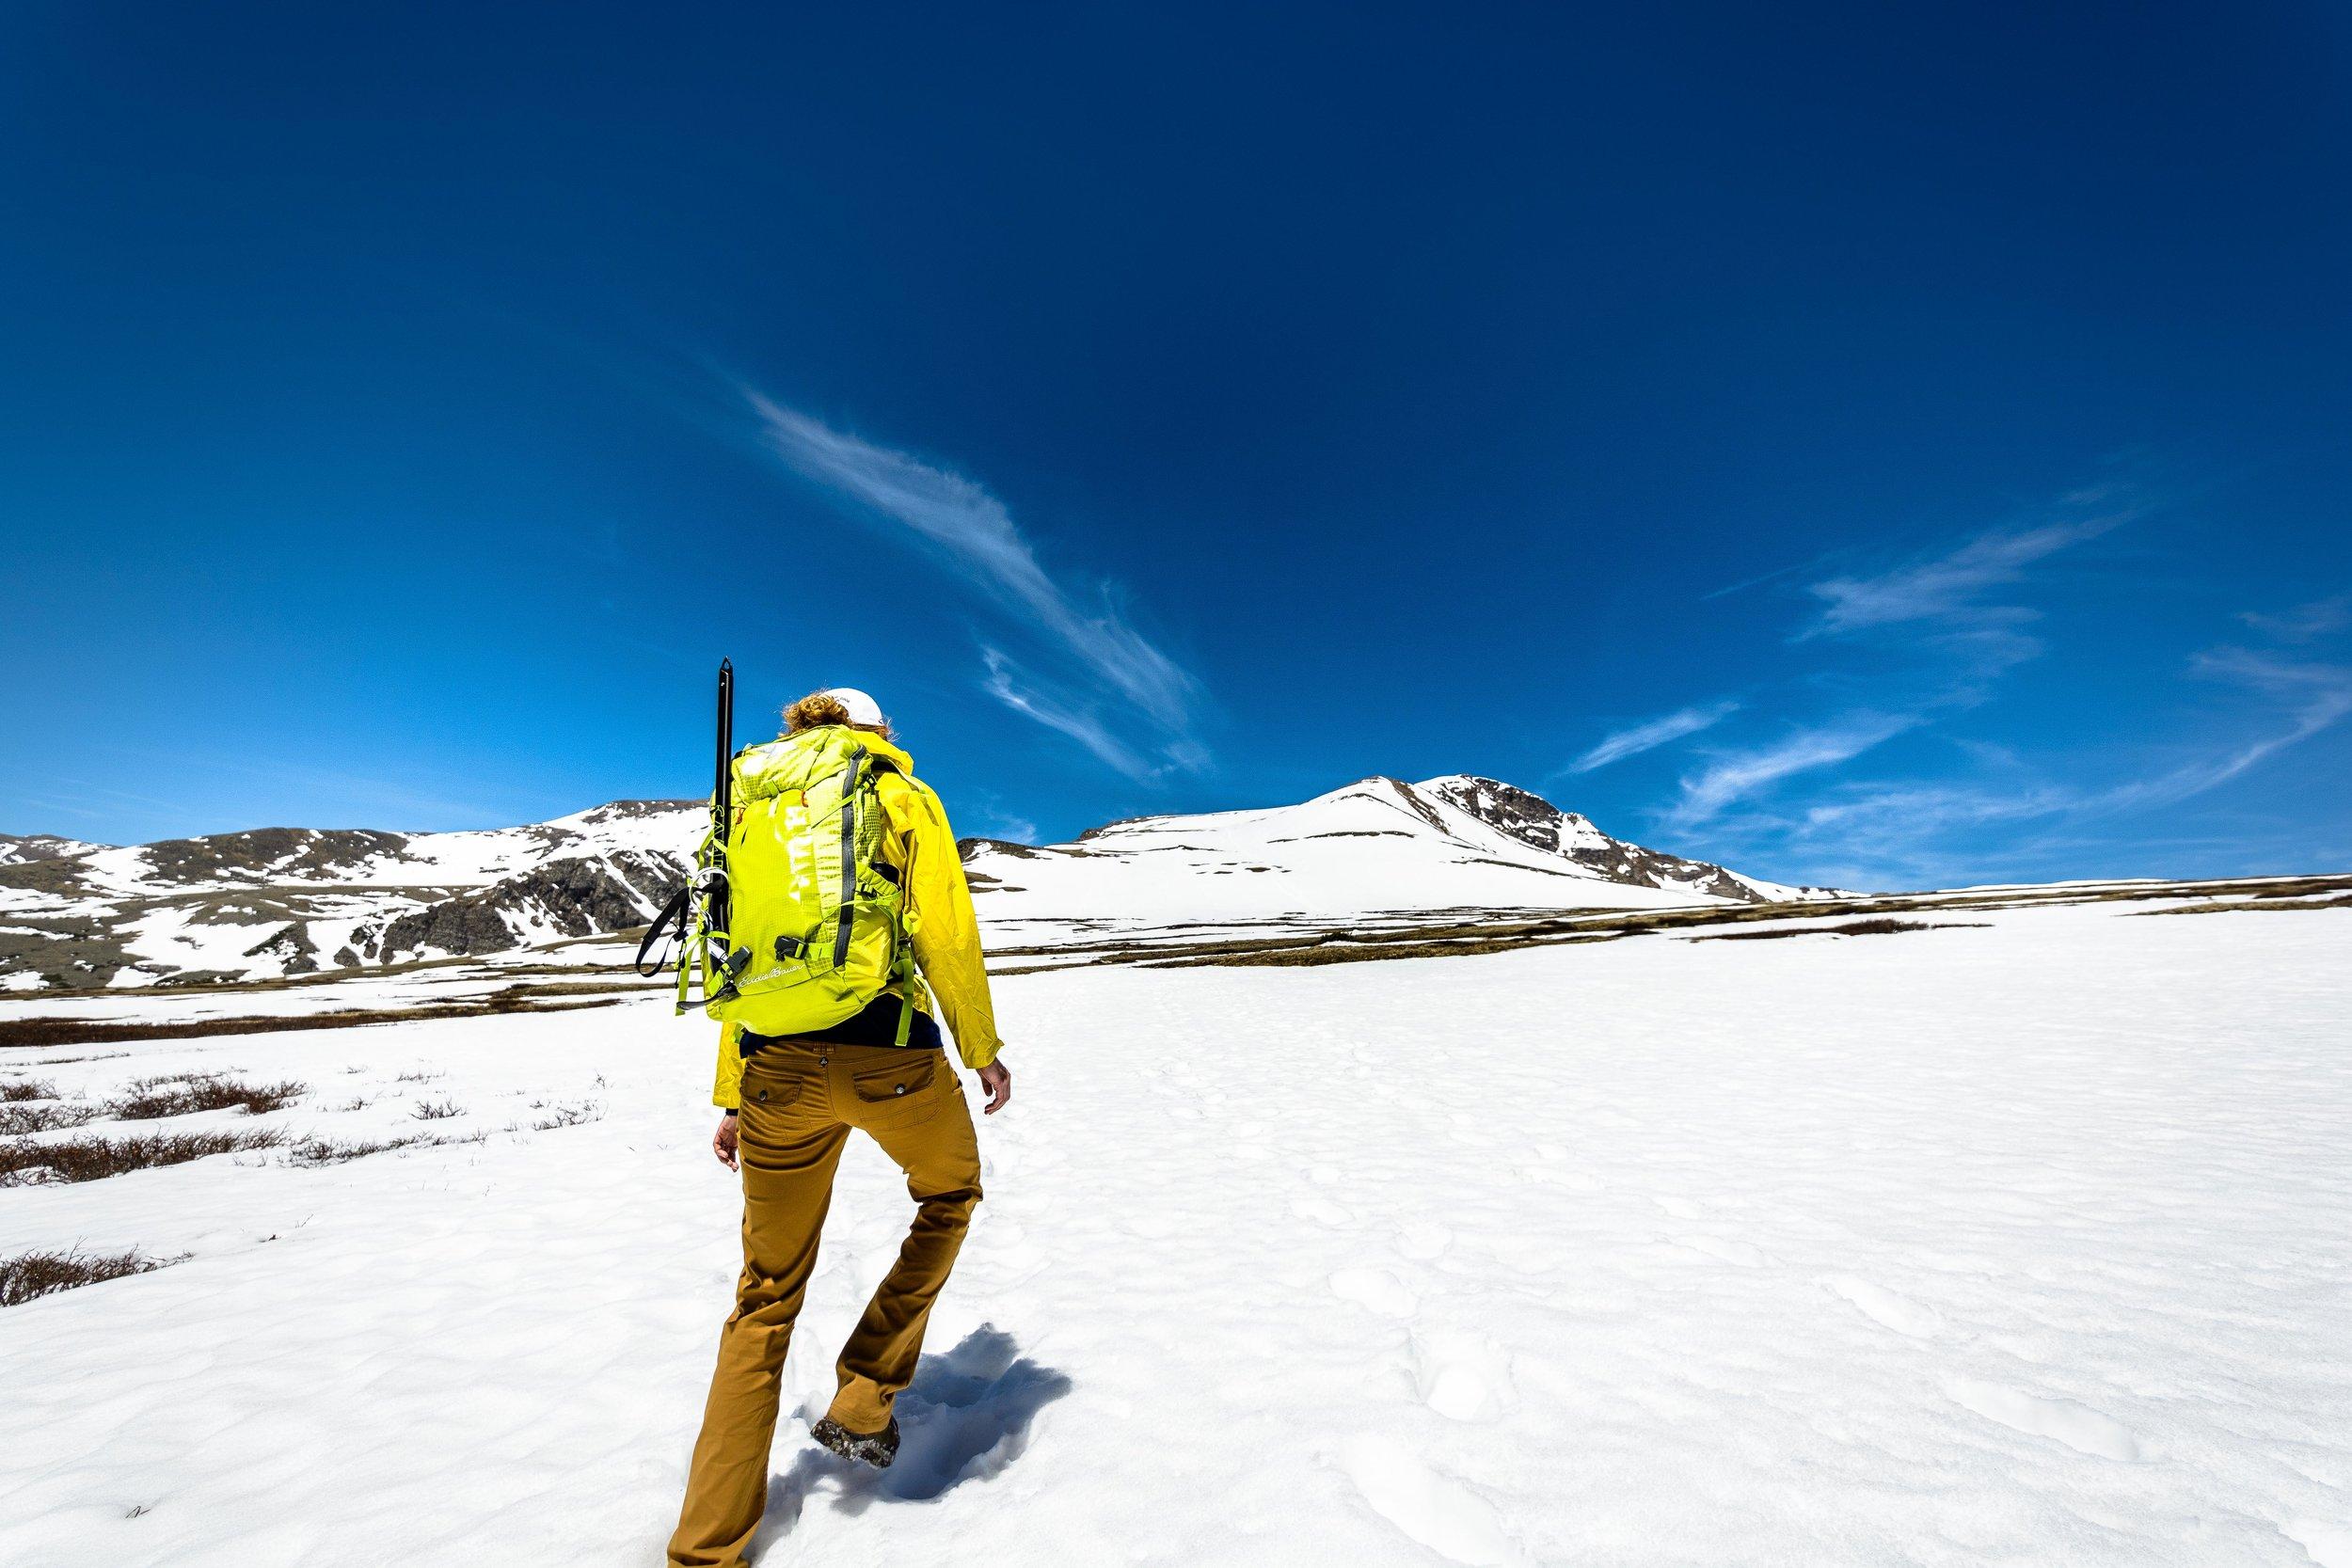 James Peak in the distance